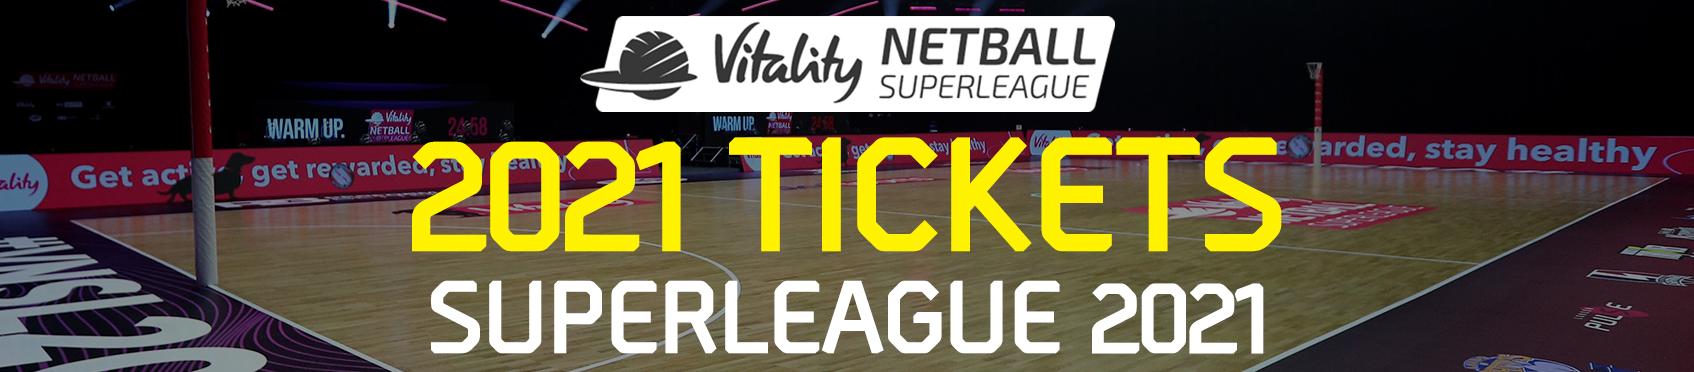 manchester thunder netball tickets 2021